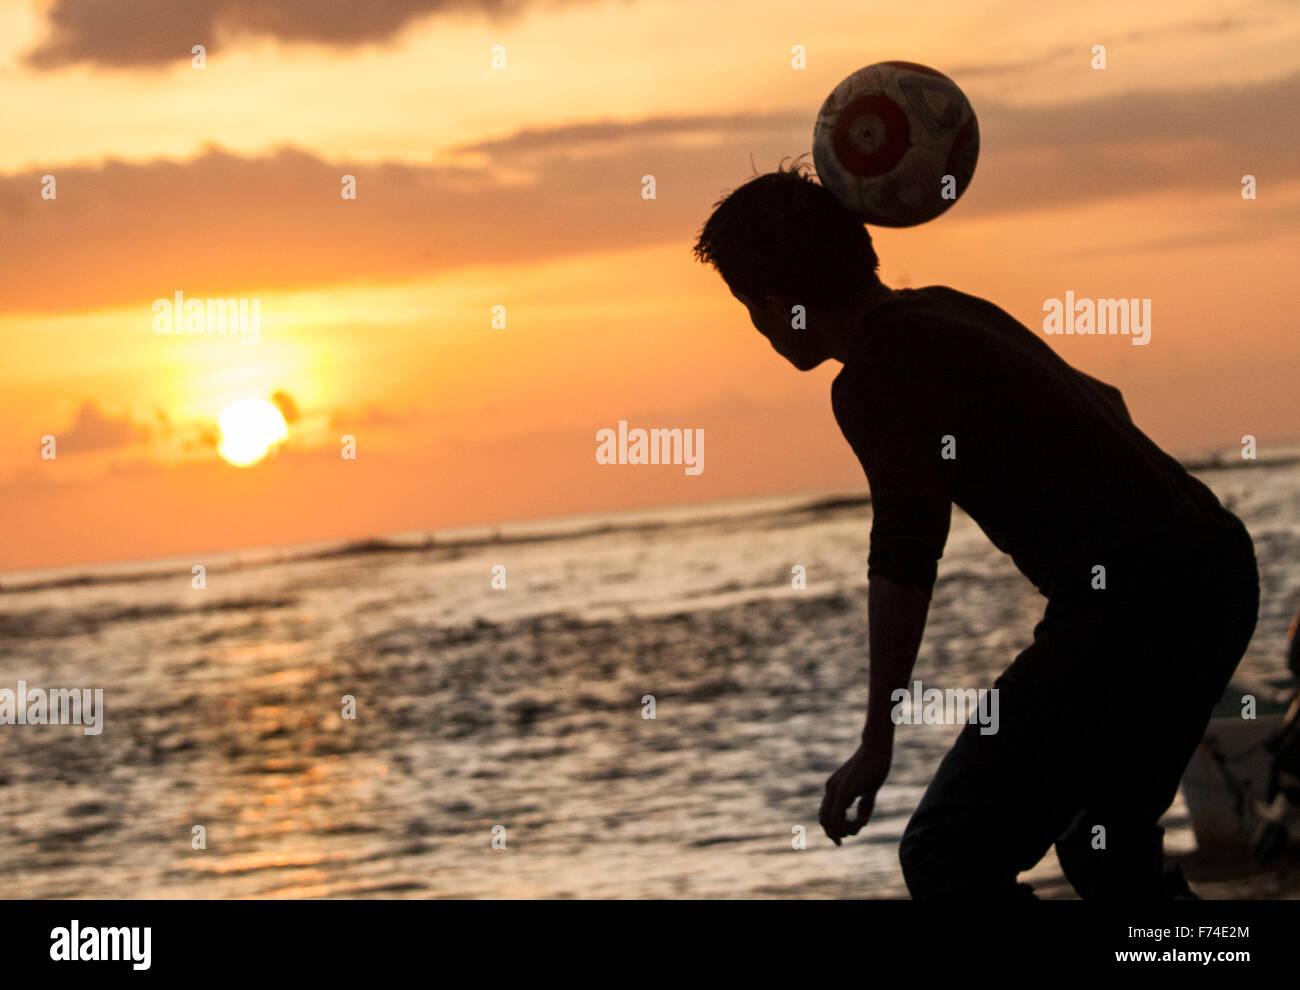 Fußball-Spieler leitet ein Ball am Strand bei Sonnenuntergang, Zihuatanejo, Guerrero, Mexiko. Stockbild